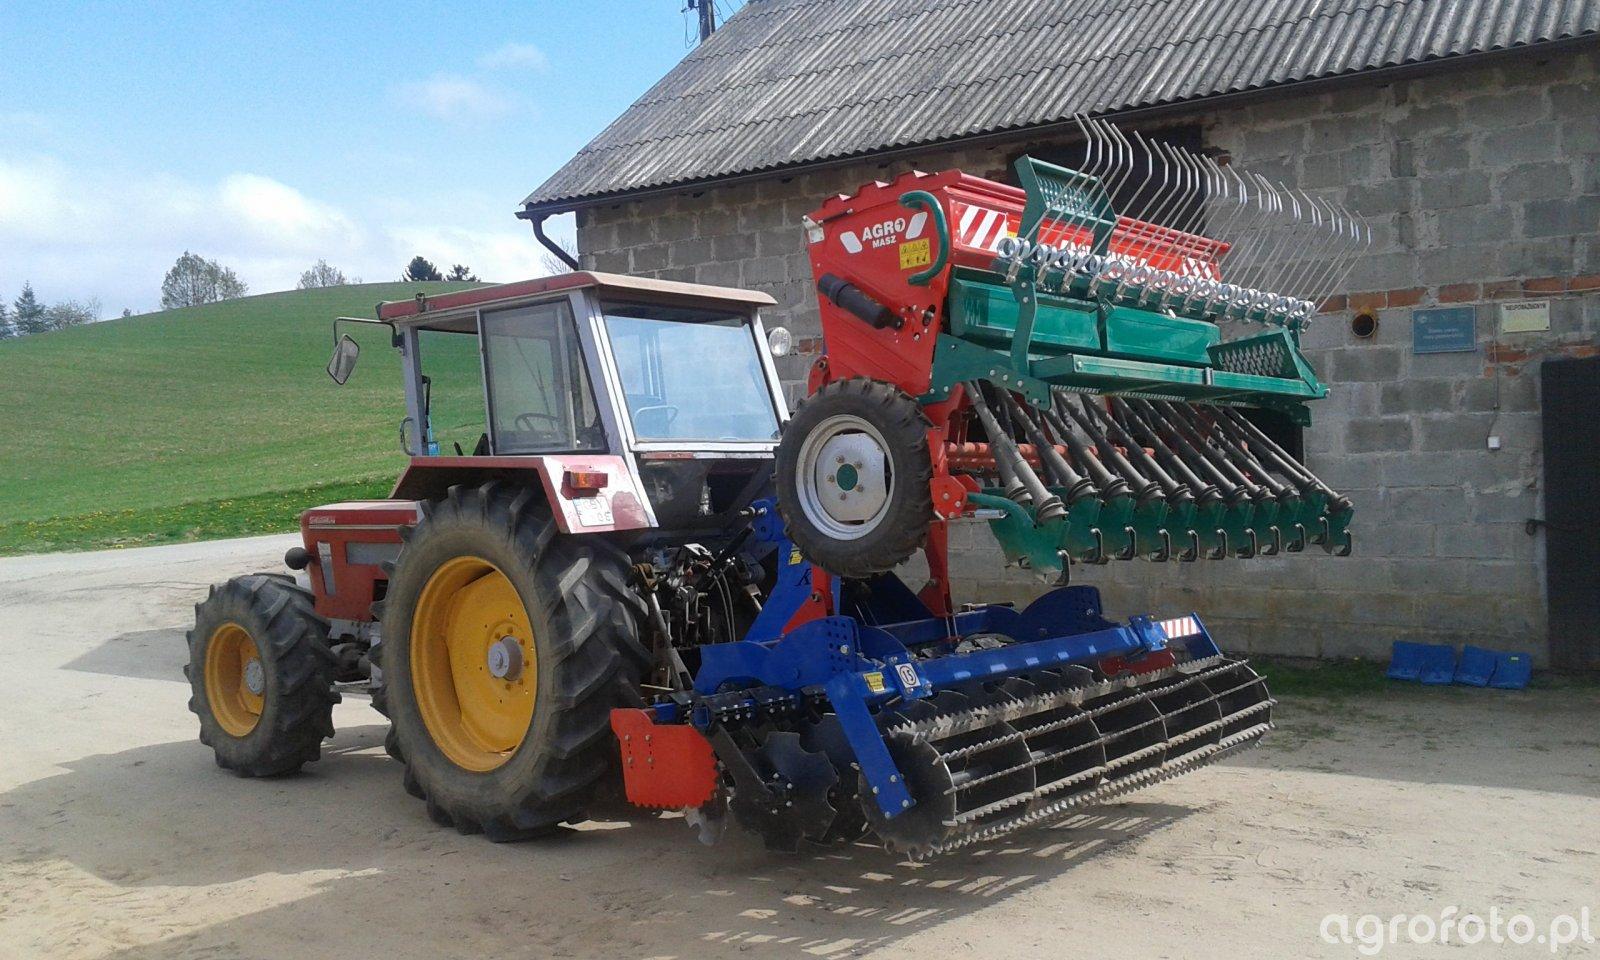 Schluter Compact 1050 V6 & Agro-Masz SR250 & Kinstall